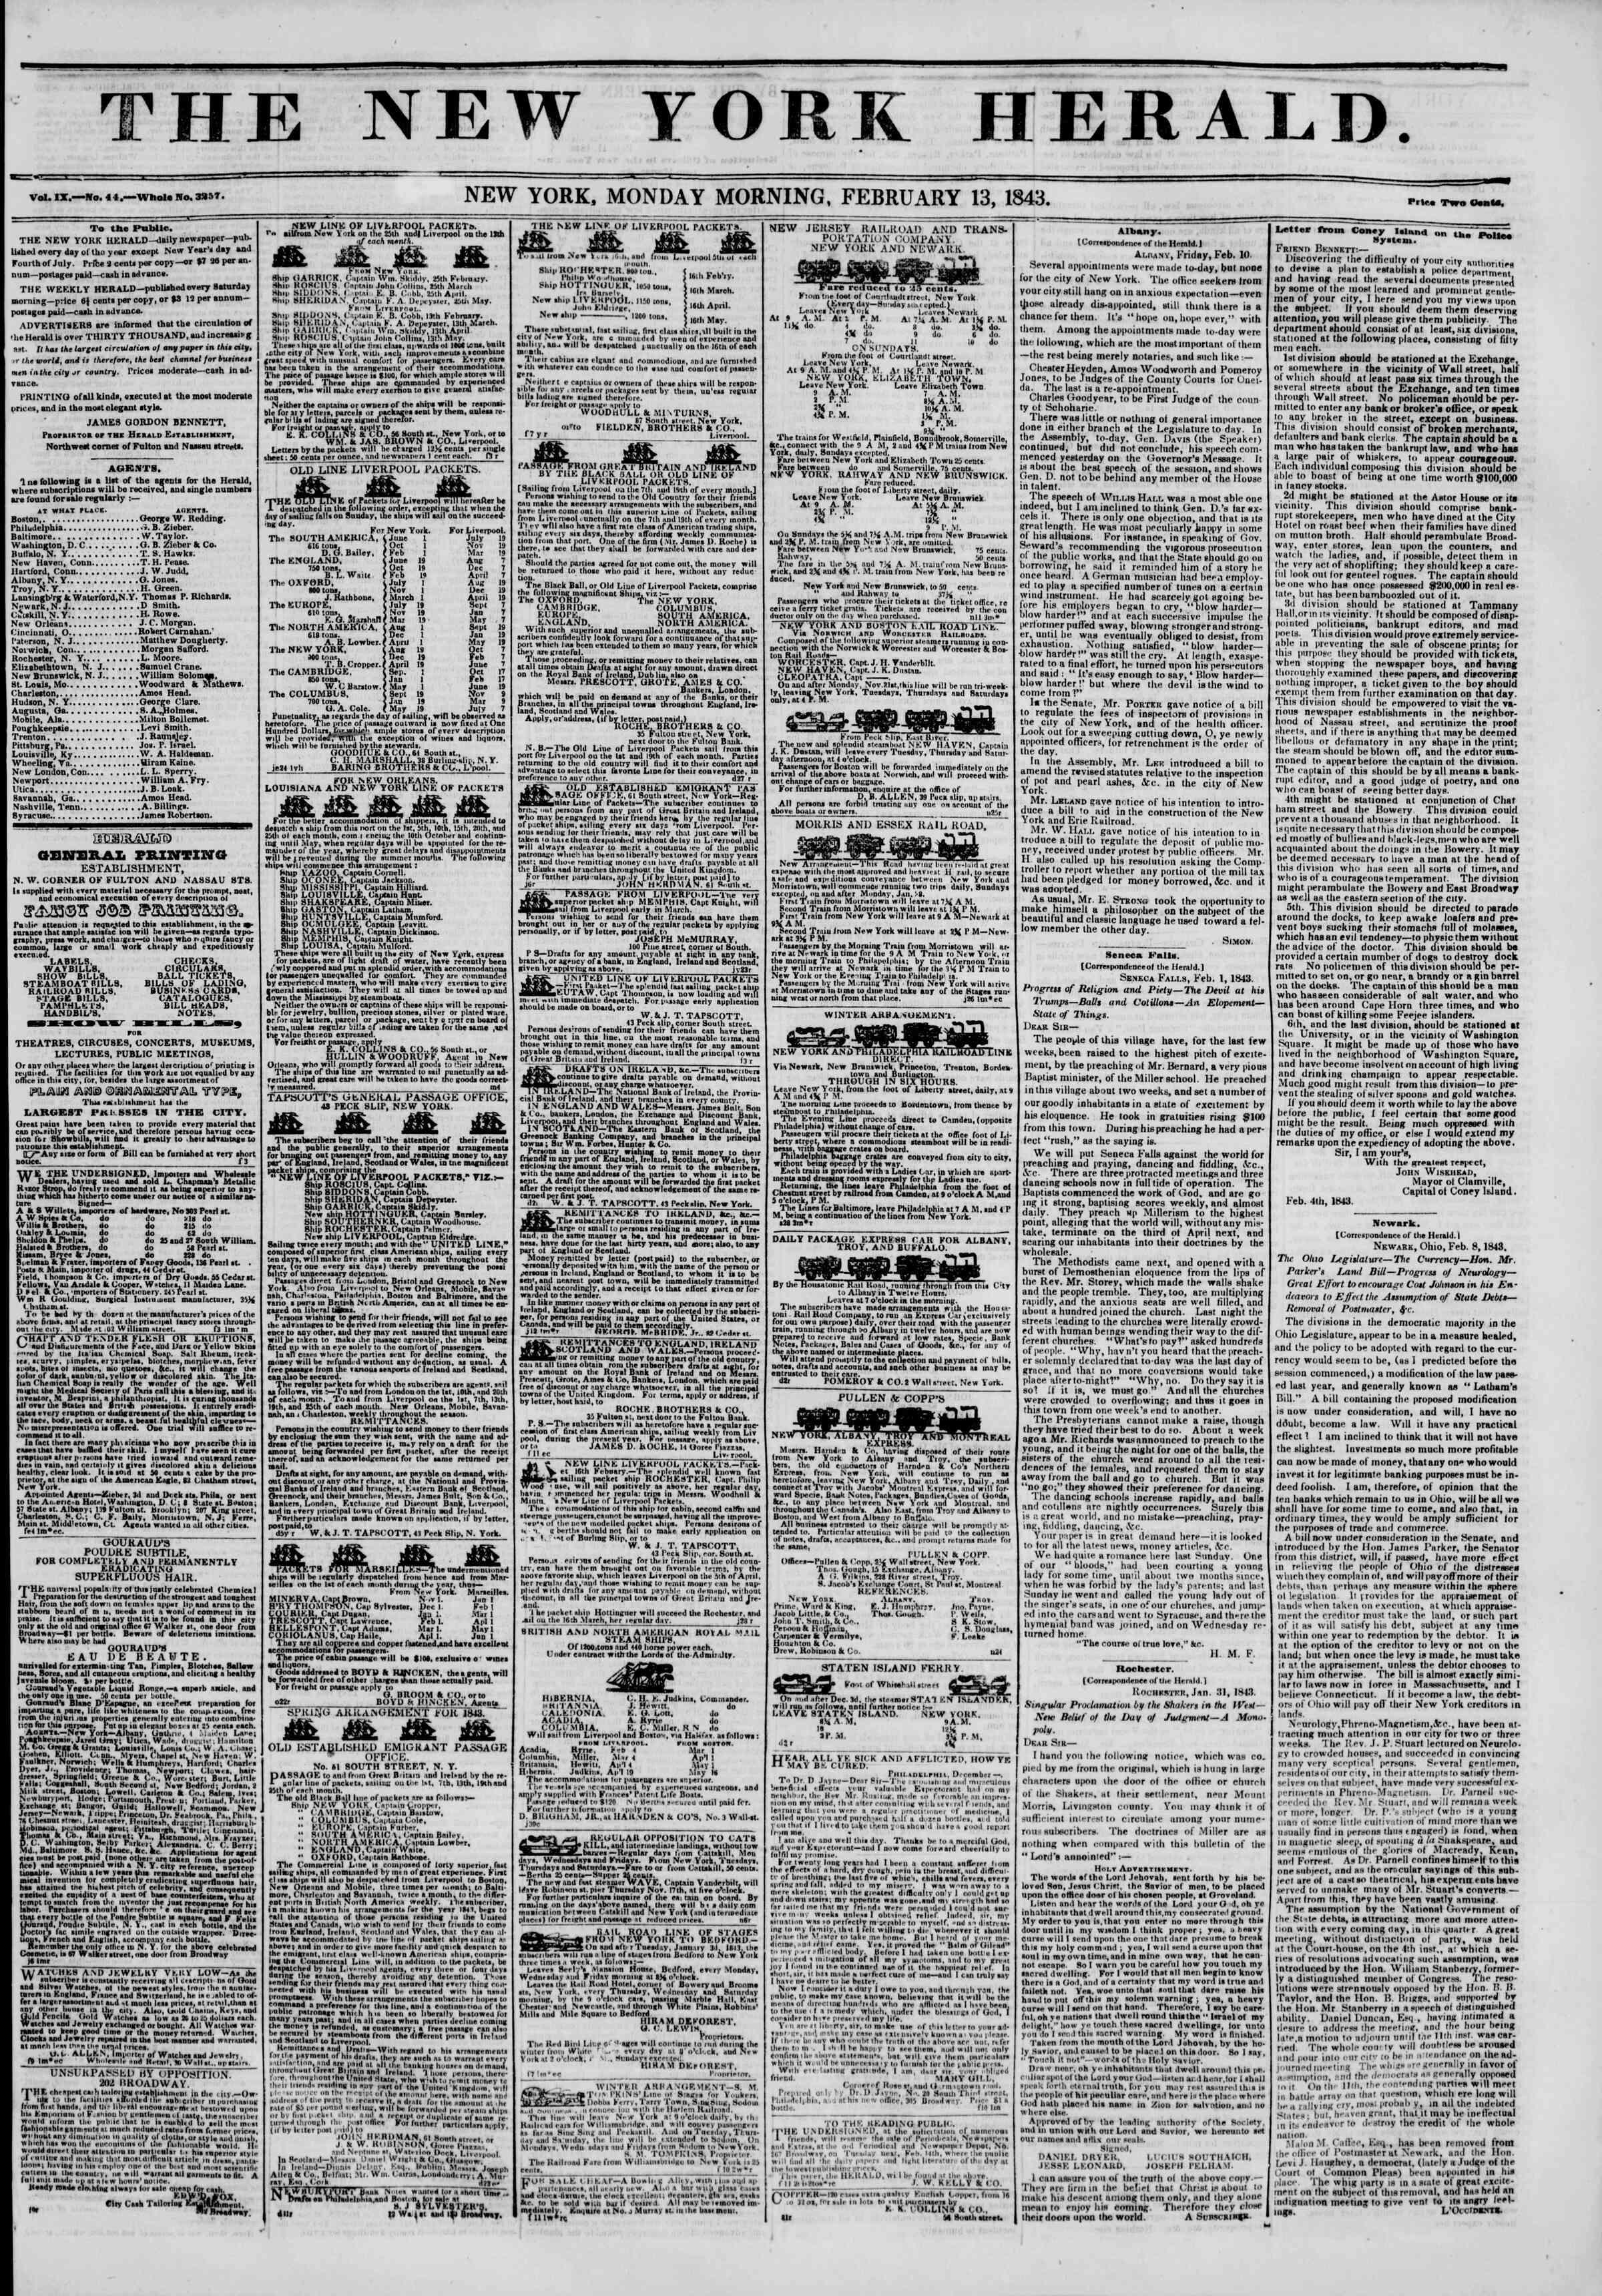 February 13, 1843 Tarihli The New York Herald Gazetesi Sayfa 1